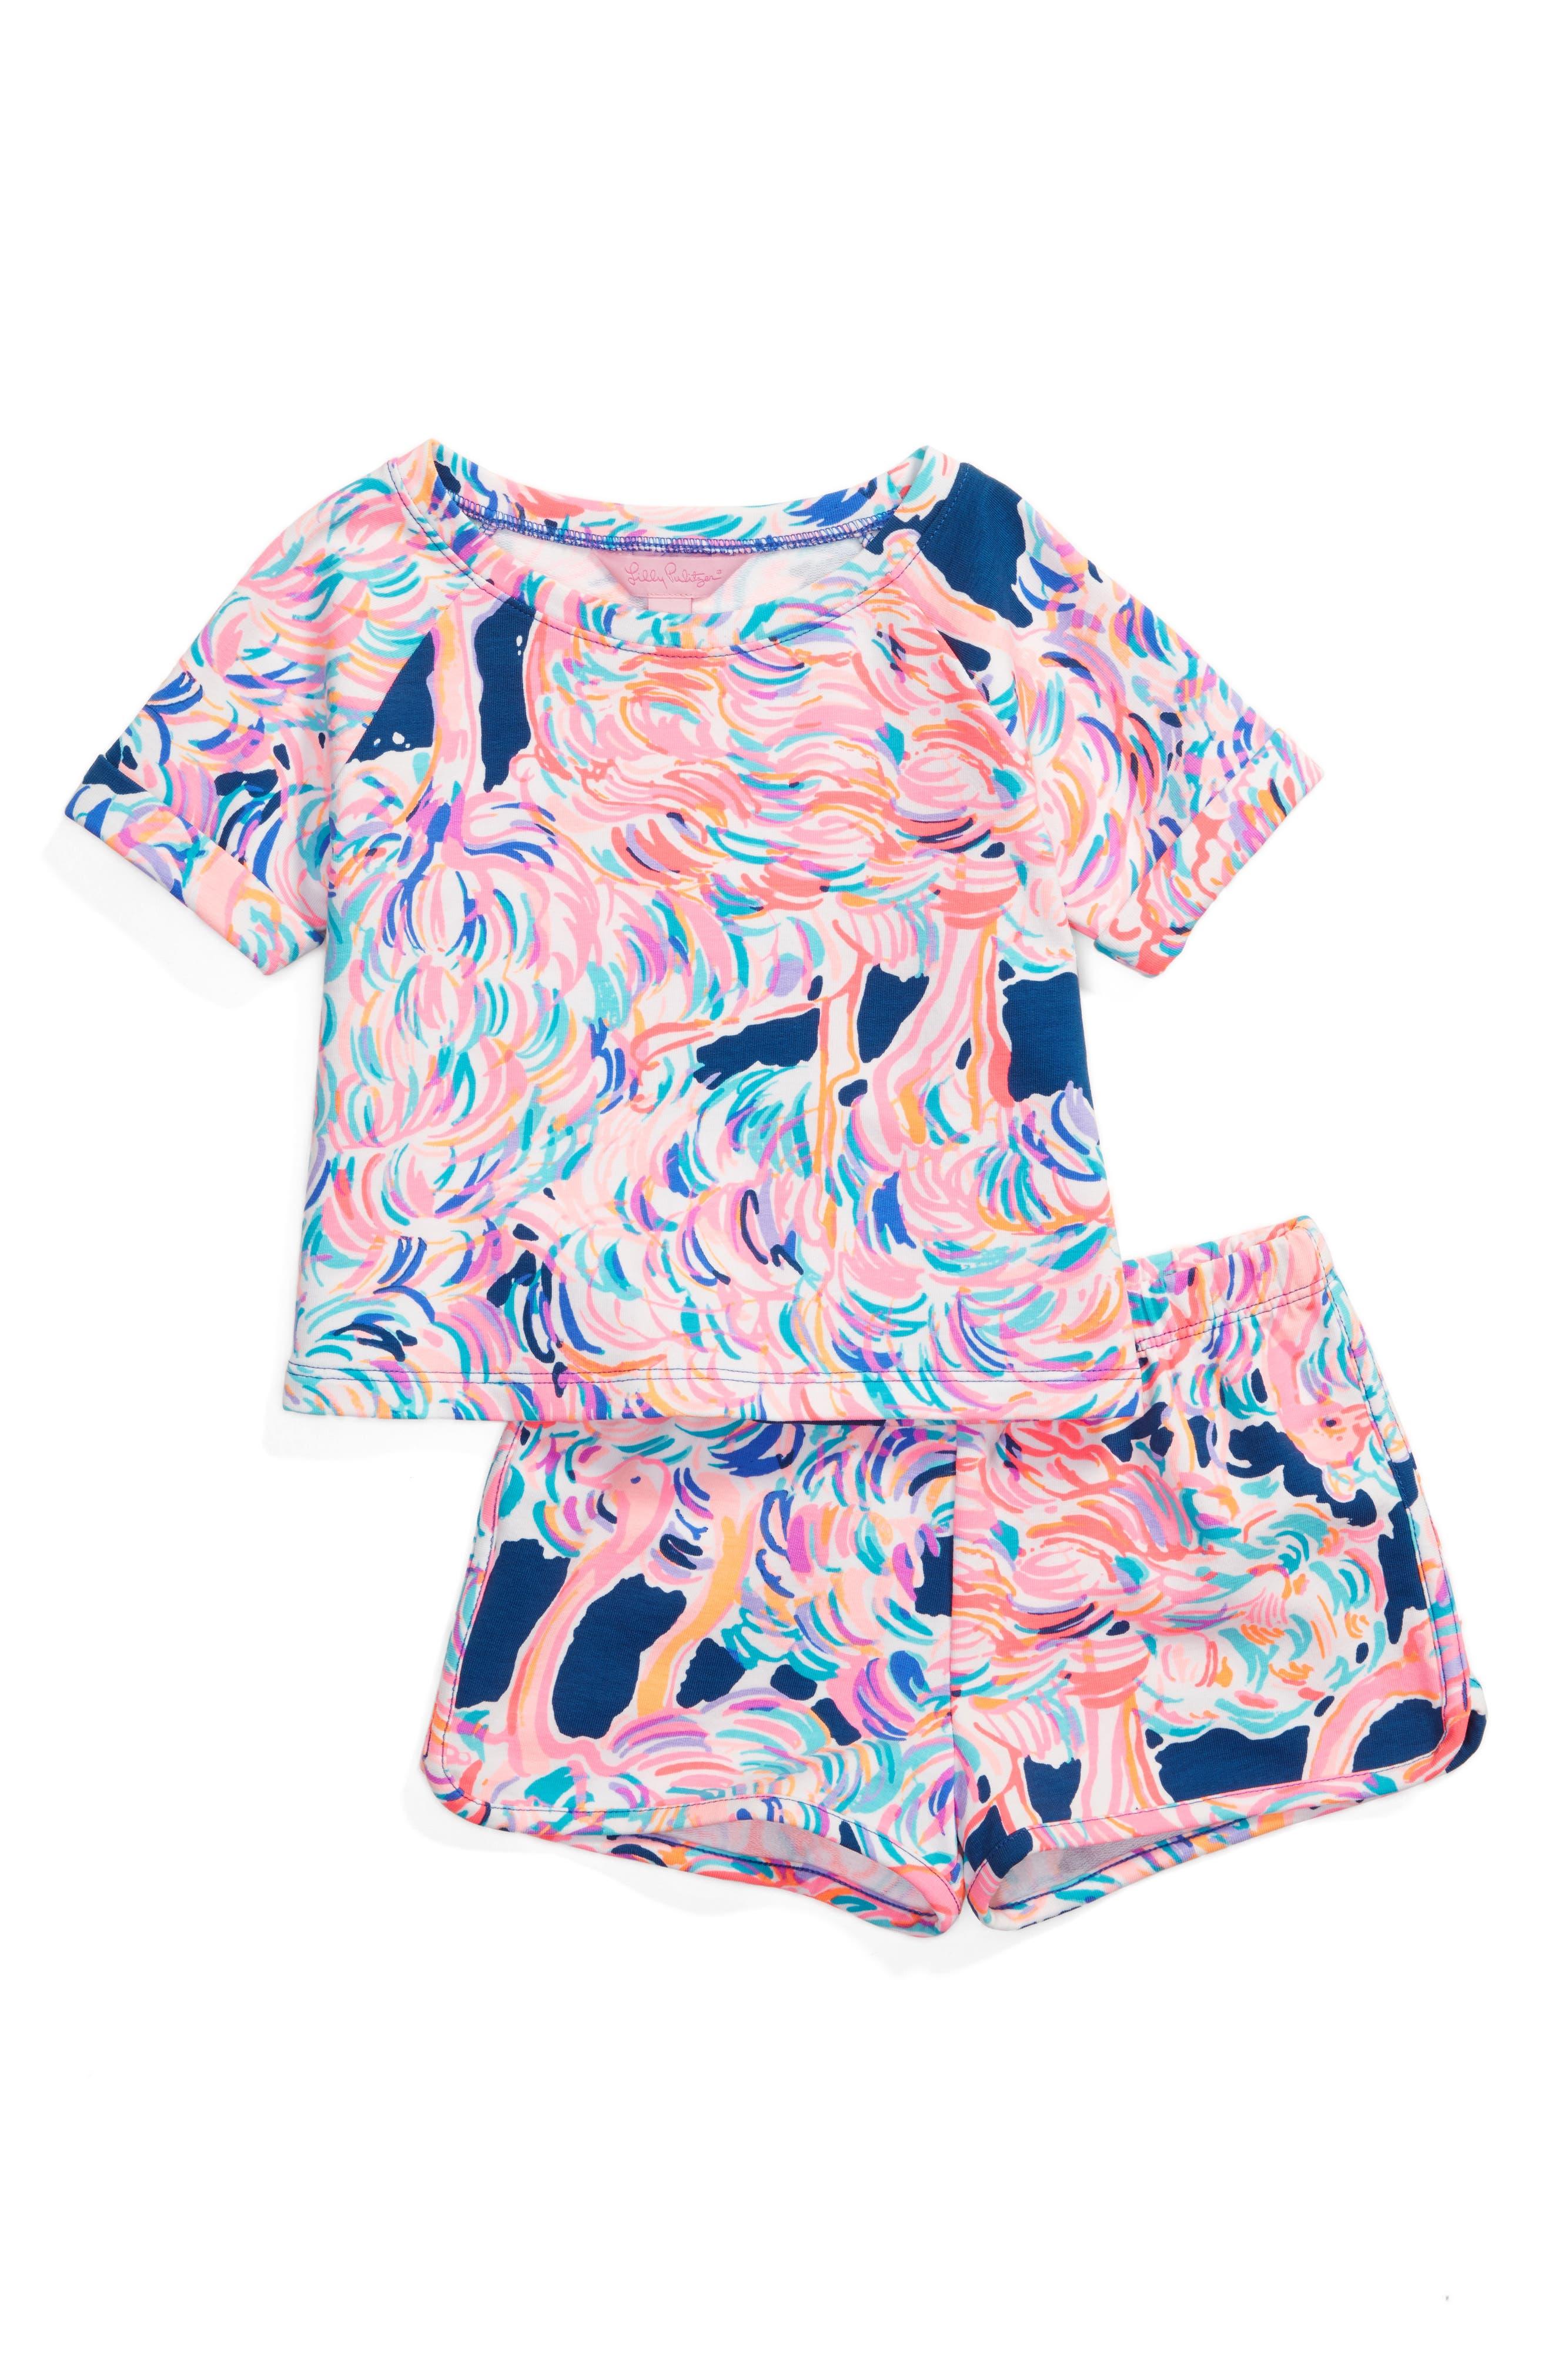 Lilly Pulitzer® Mini Dossie Top & Shorts Set (Toddler Girls, Little Girls & Big Girls)